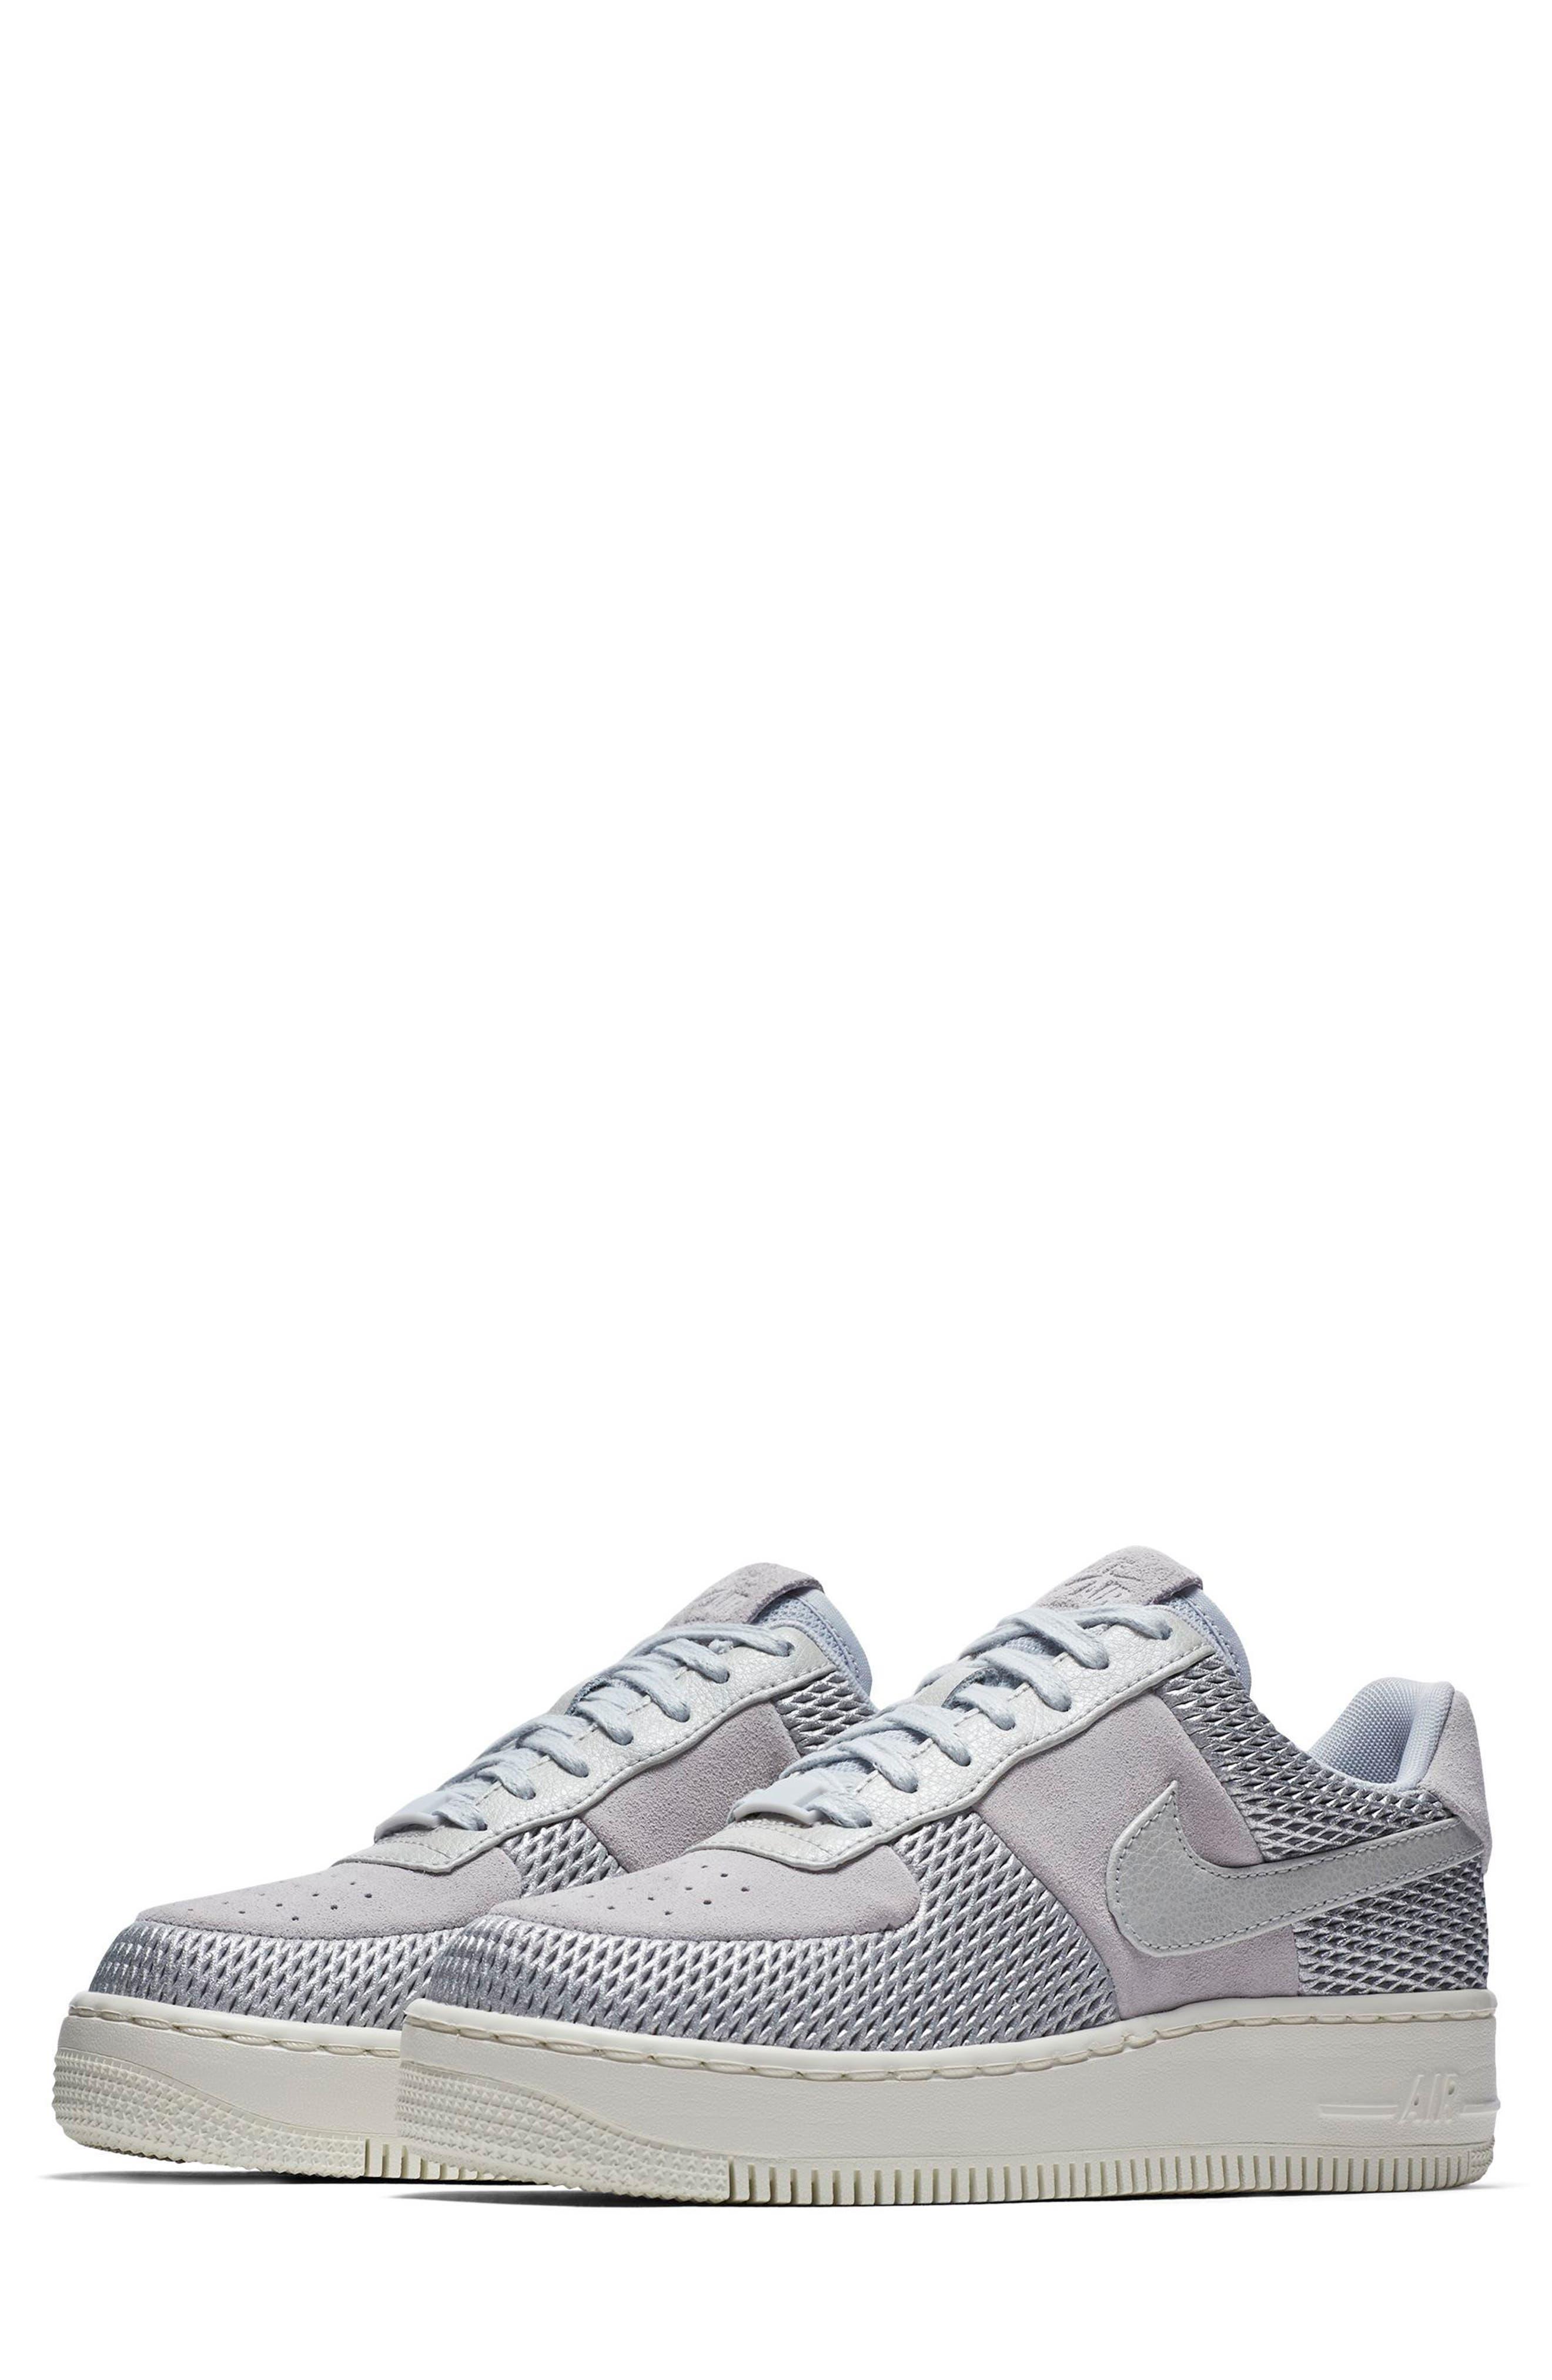 Nike Air Force 1 Upstep Premium Platform Sneaker (Women)